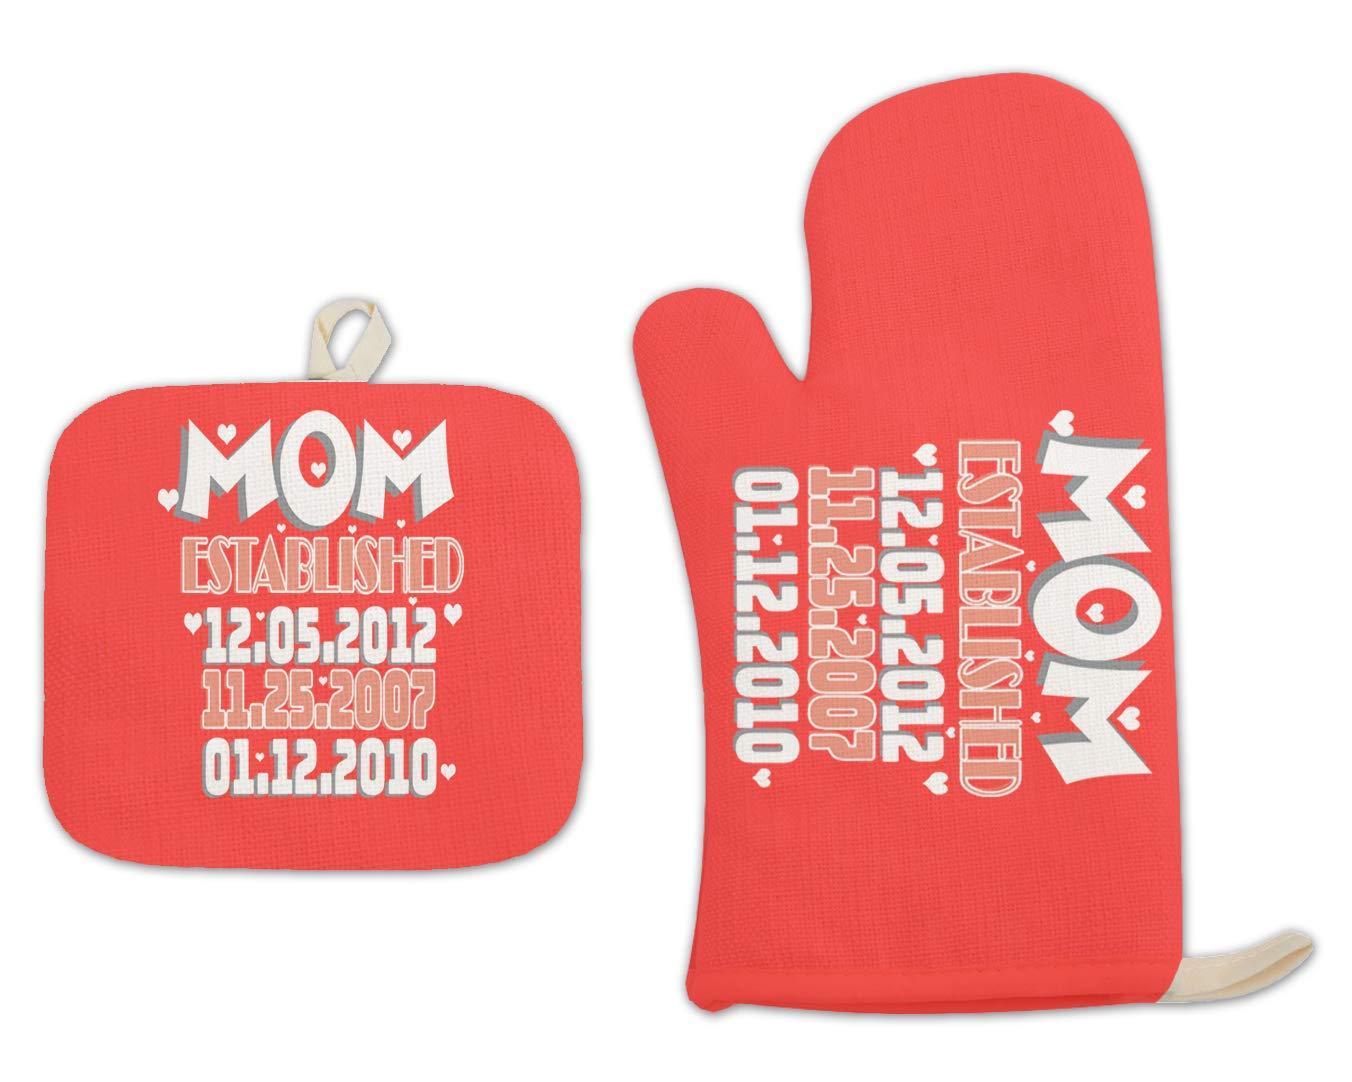 Bleu Reign BRGiftShop Personalized Custom Name Mom Established Children Child Birthday Dates Linen Oven Mitt and Potholder Set